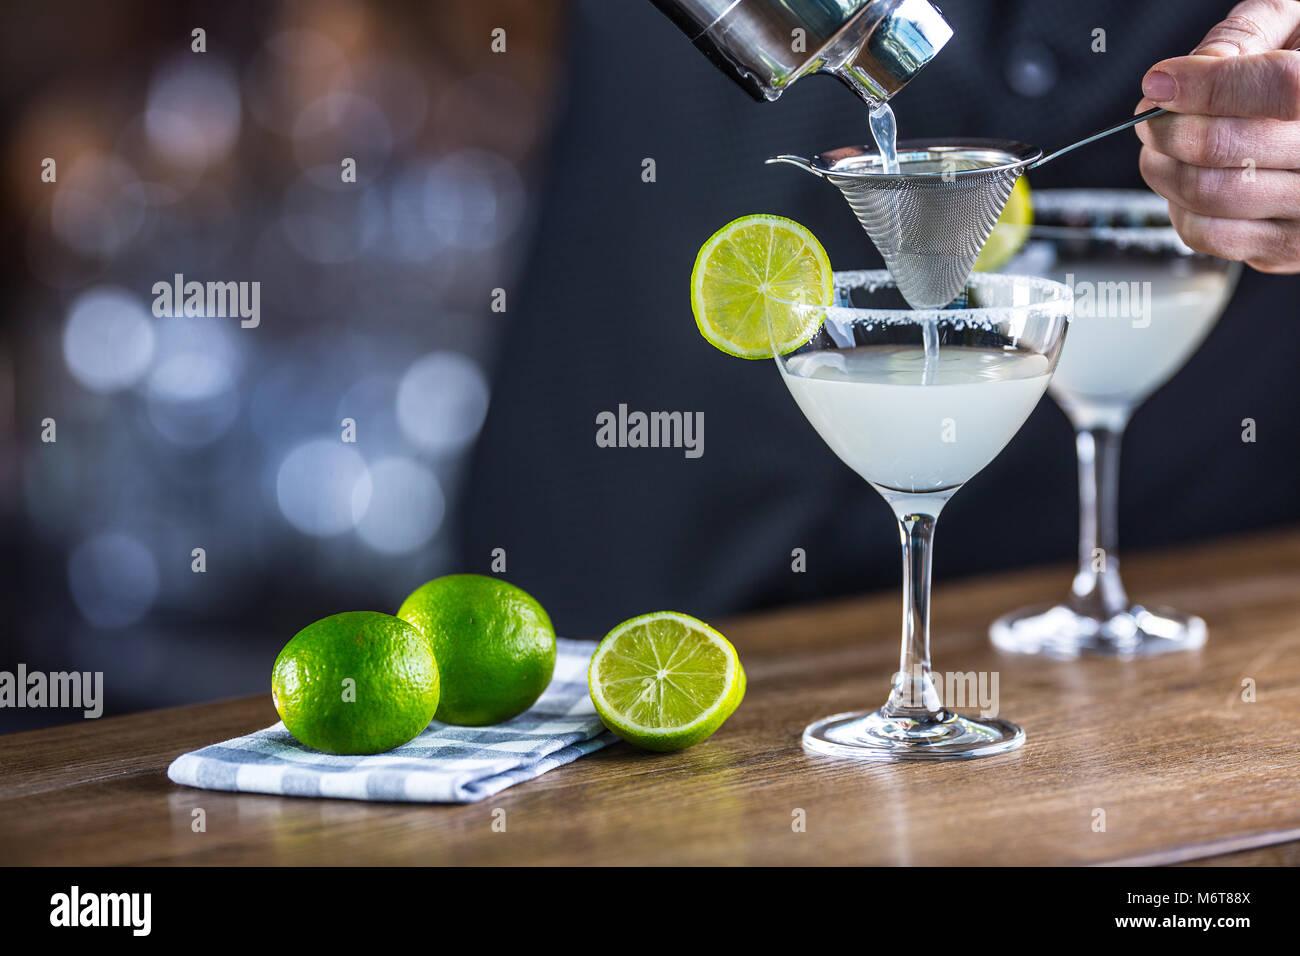 Margarita. Margatita alcoholic cocktail drink on barcounter in pub or restaurant. Barman preparing a cocktail drink. - Stock Image